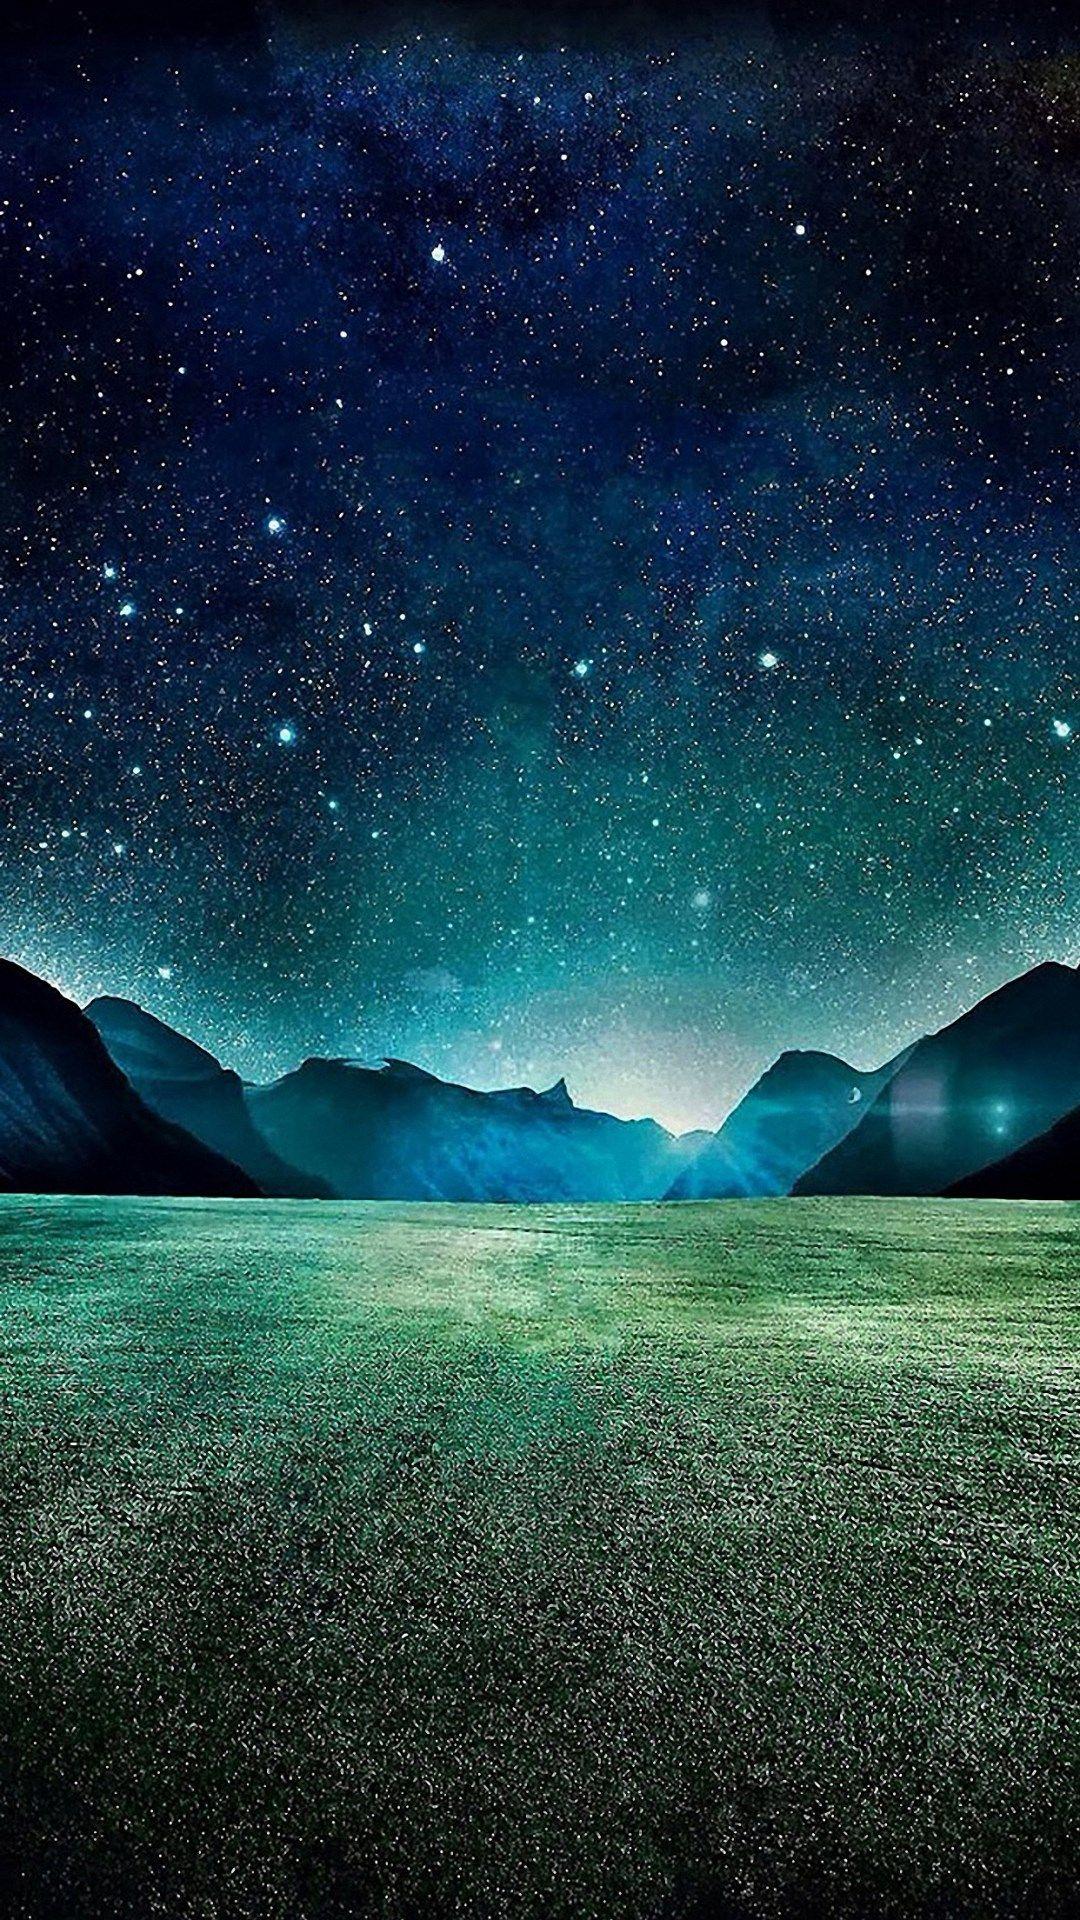 iphone 4 backgrounds hd 1080x1920 Landscape wallpaper